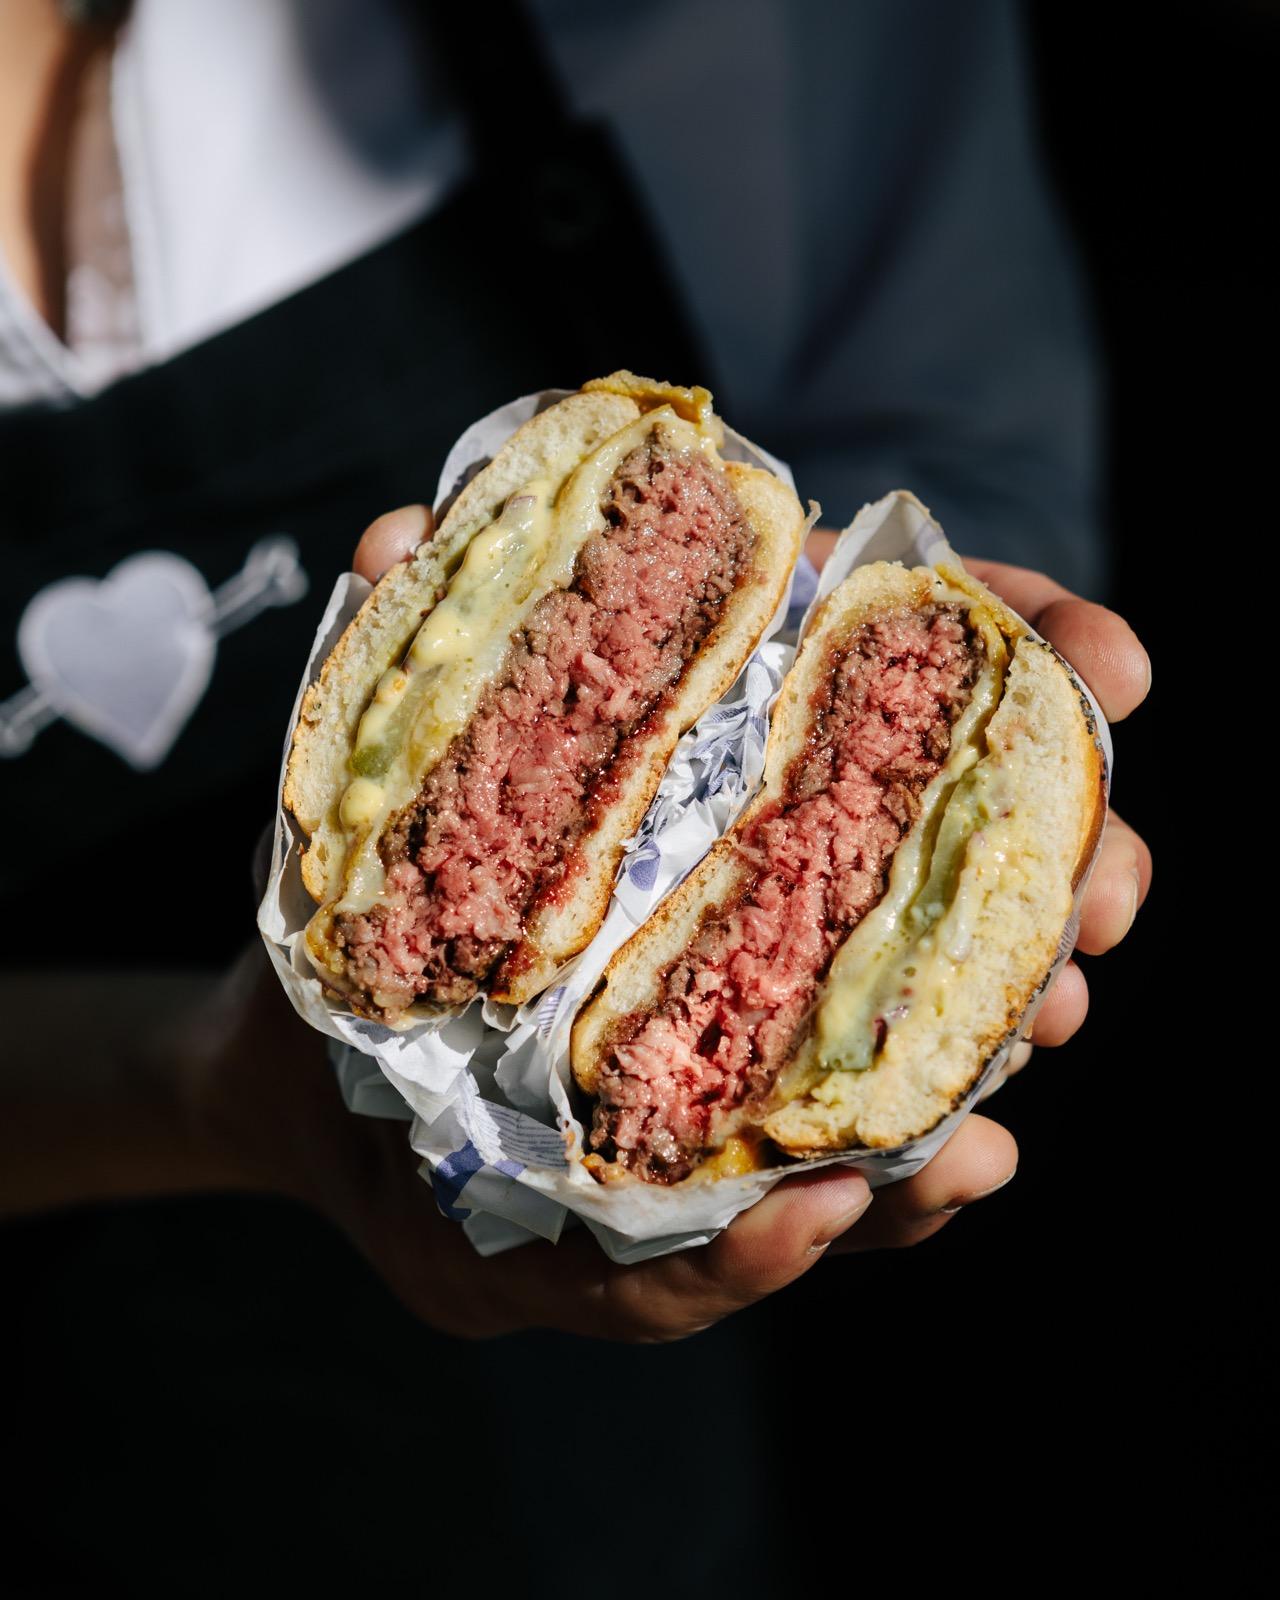 Our hamburger